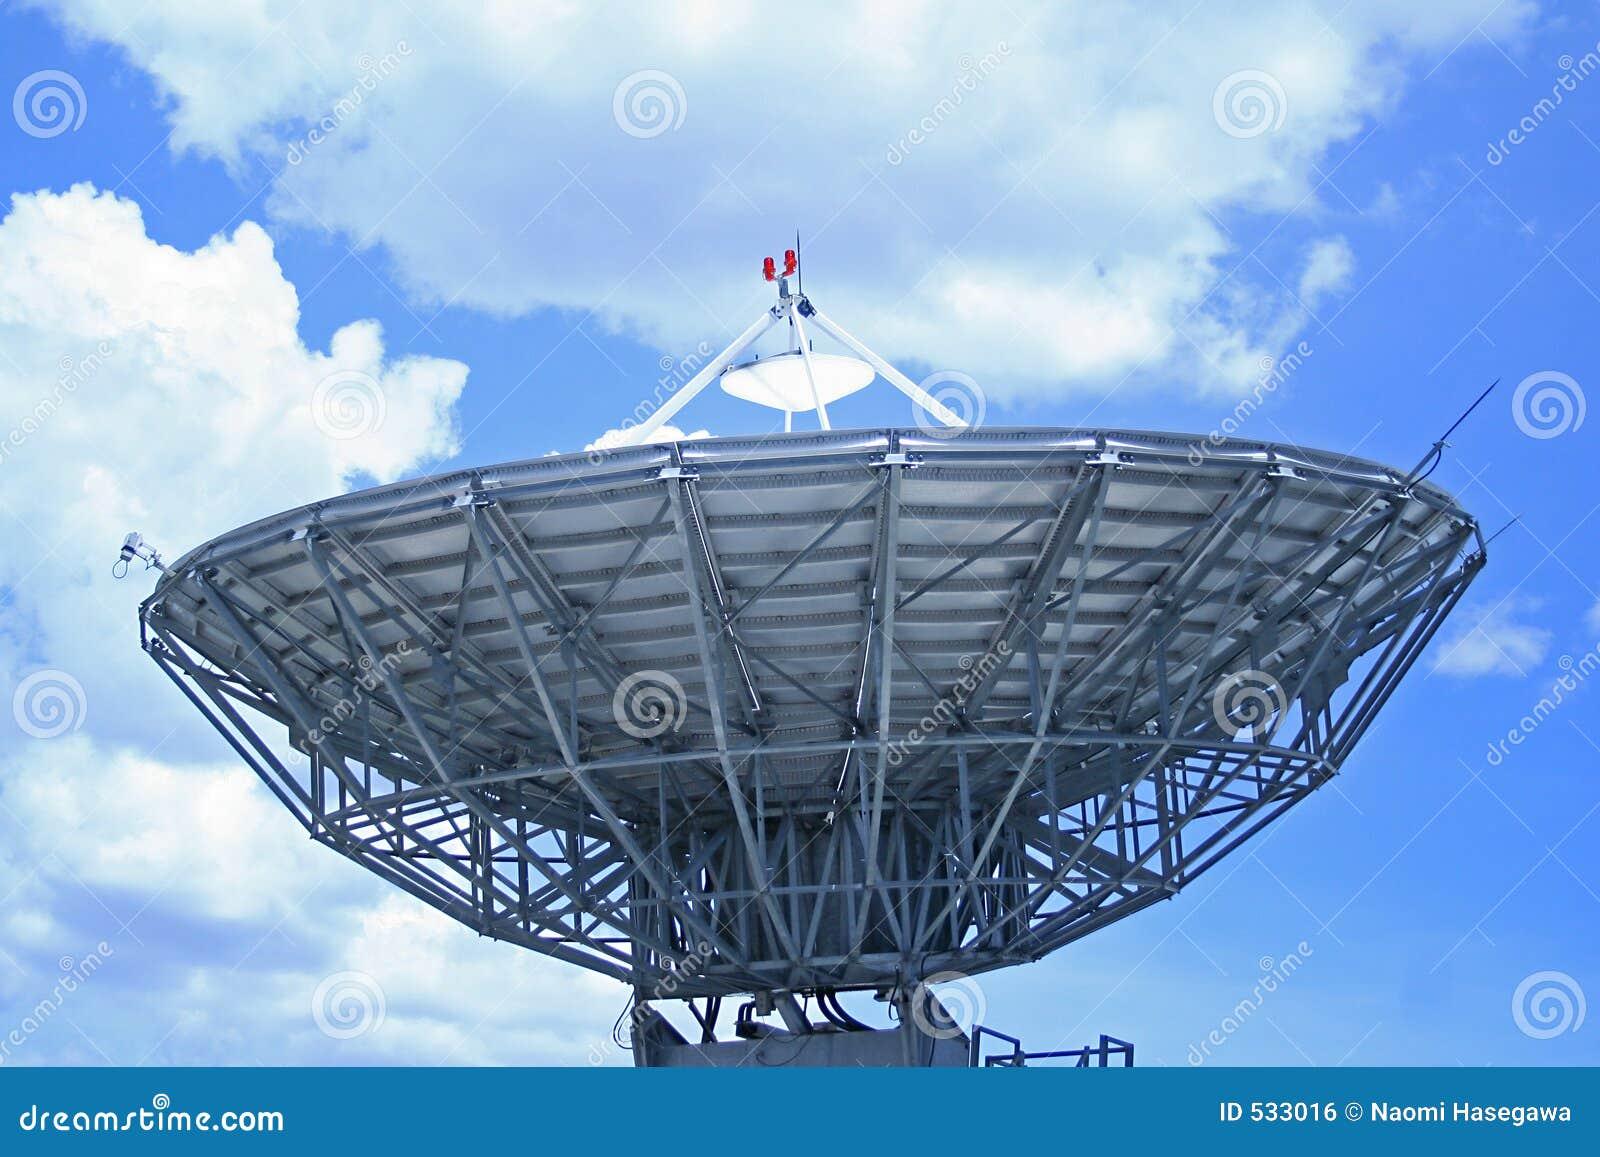 Download 卫星 库存照片. 图片 包括有 商业, 空间, 电视, 现代, 谈话, 电缆, 天线, 电话, 公司, 网络 - 533016